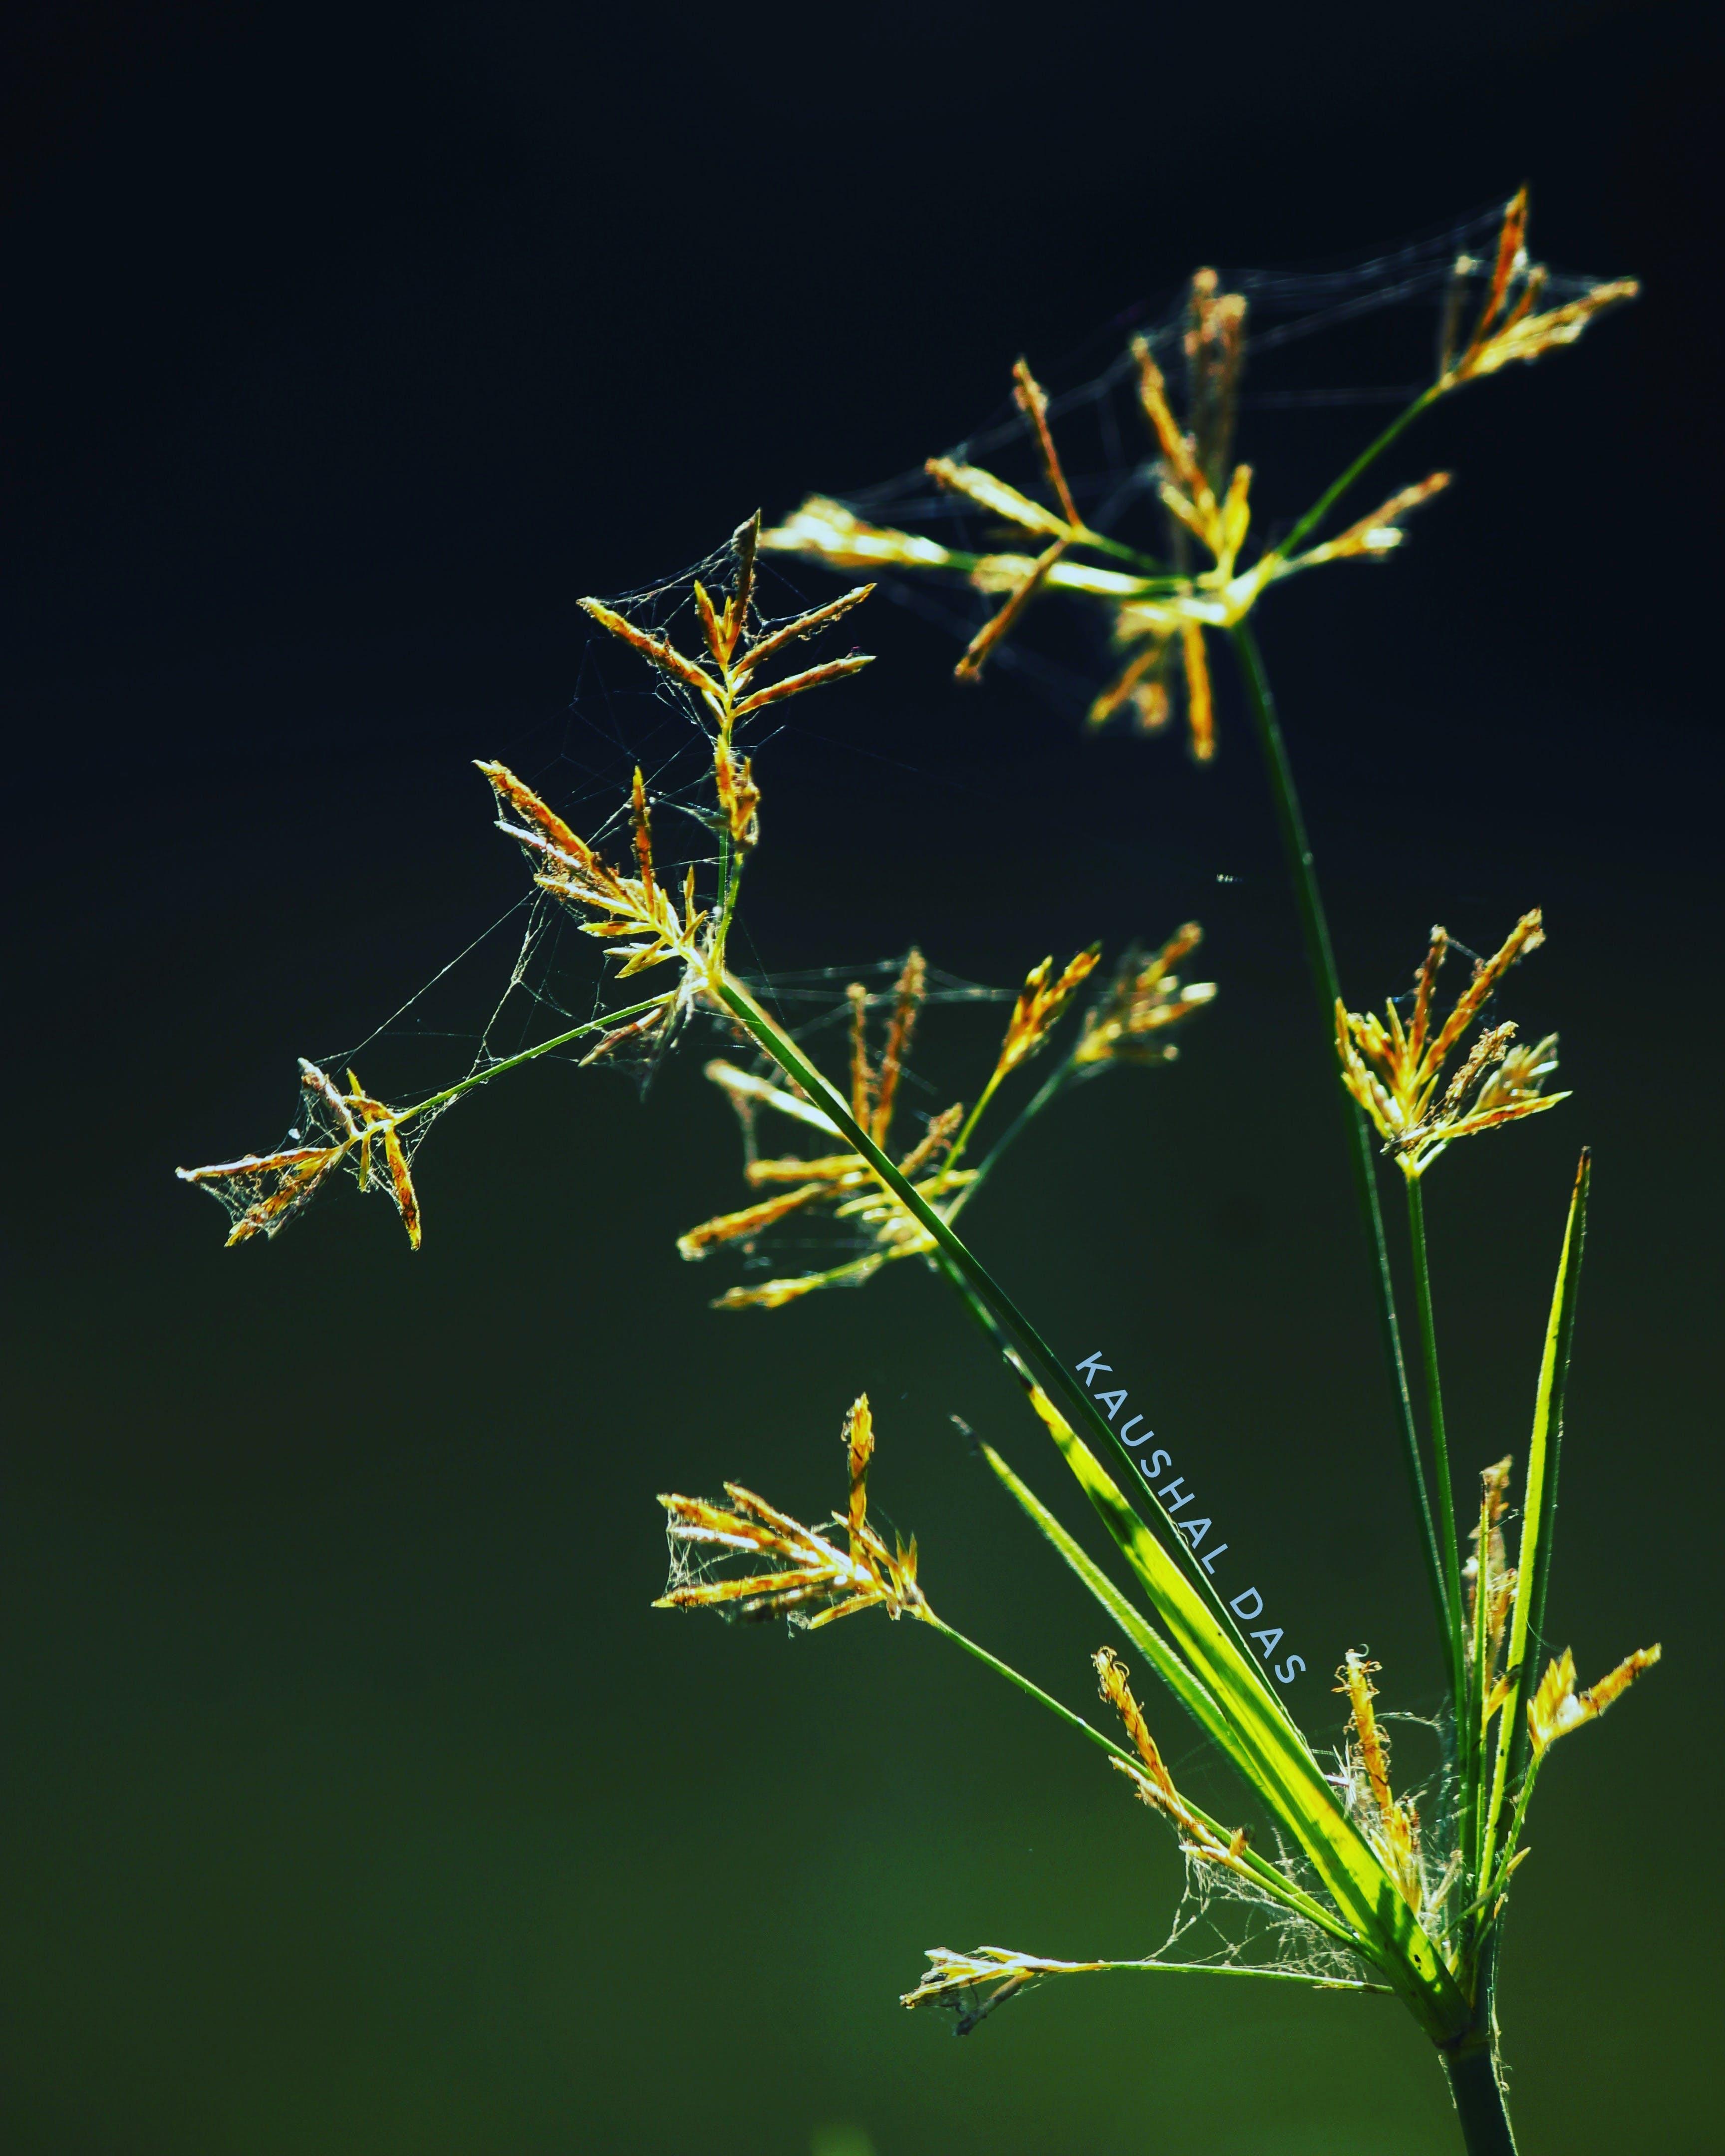 Free stock photo of #herb, #Nature #Photography, macro photo